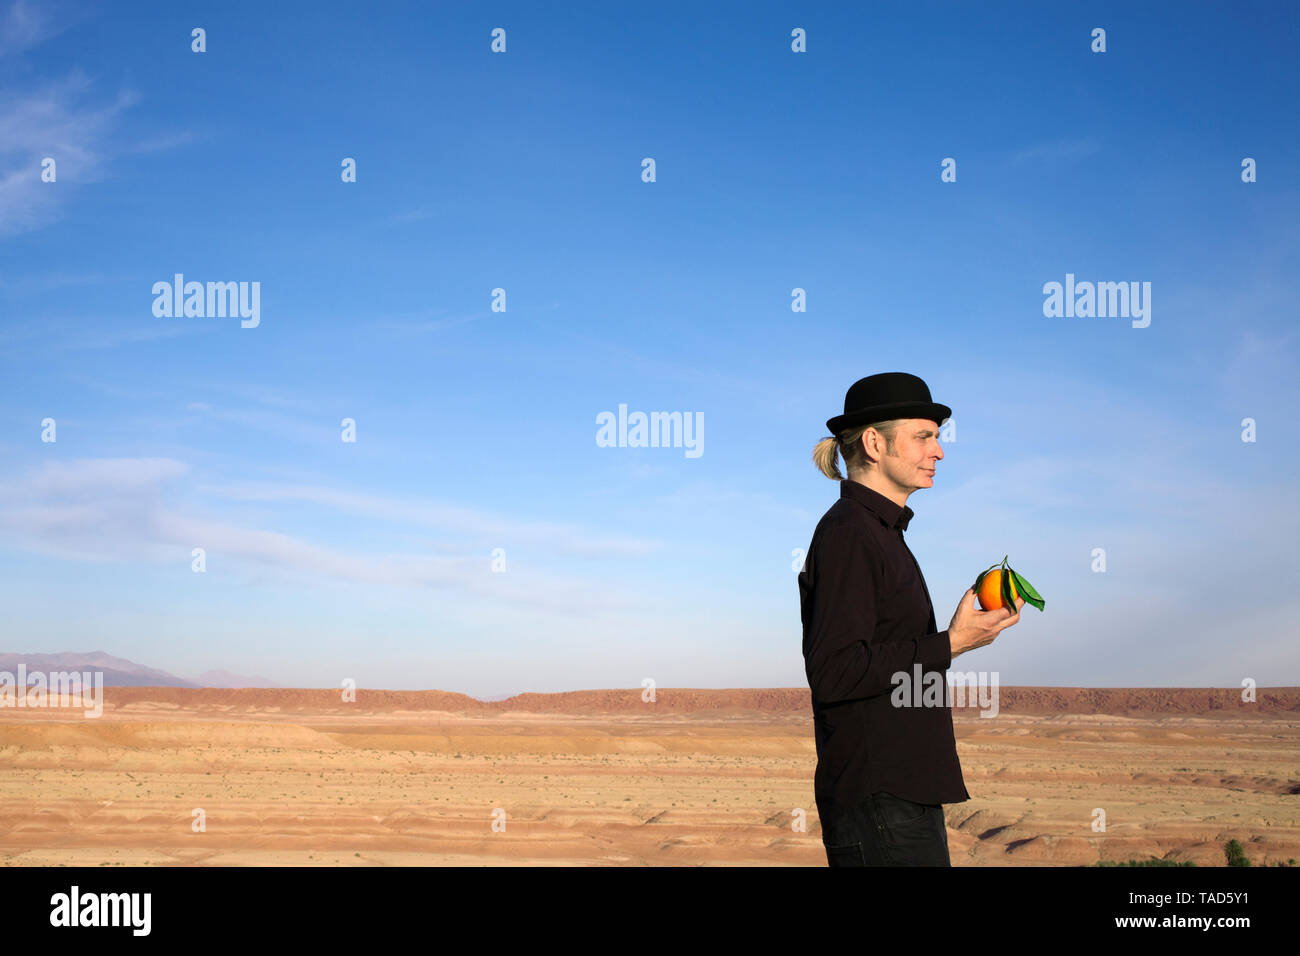 Morocco, Ounila Valley, man wearing a bowler hat holding an orange - Stock Image